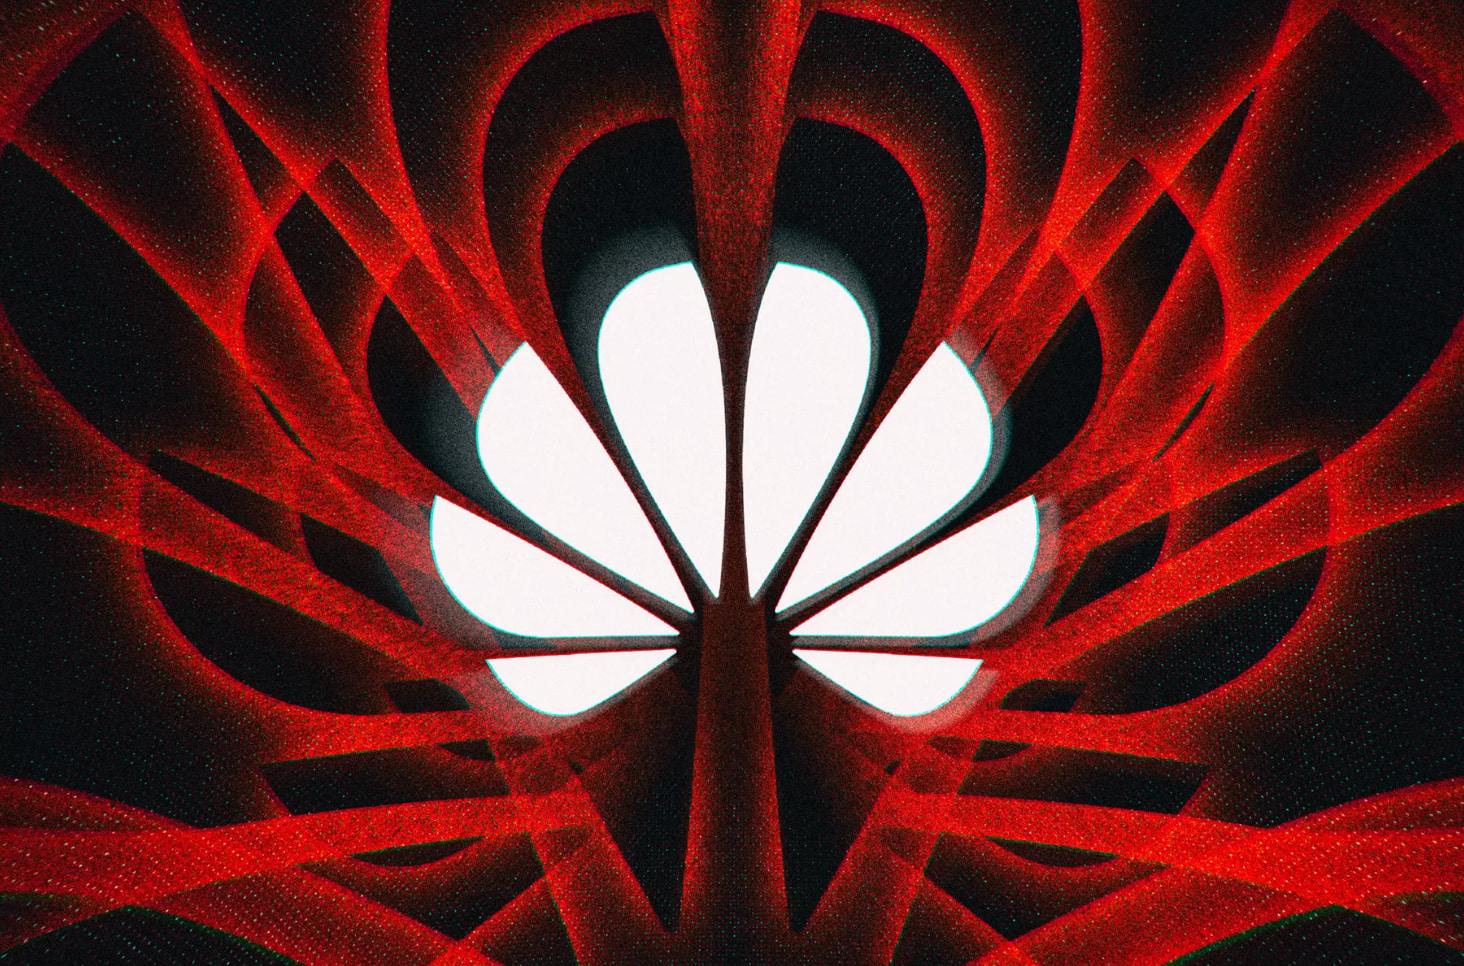 Huawei: Hongmeng OS potrebbe essere rivelato questa settimana thumbnail